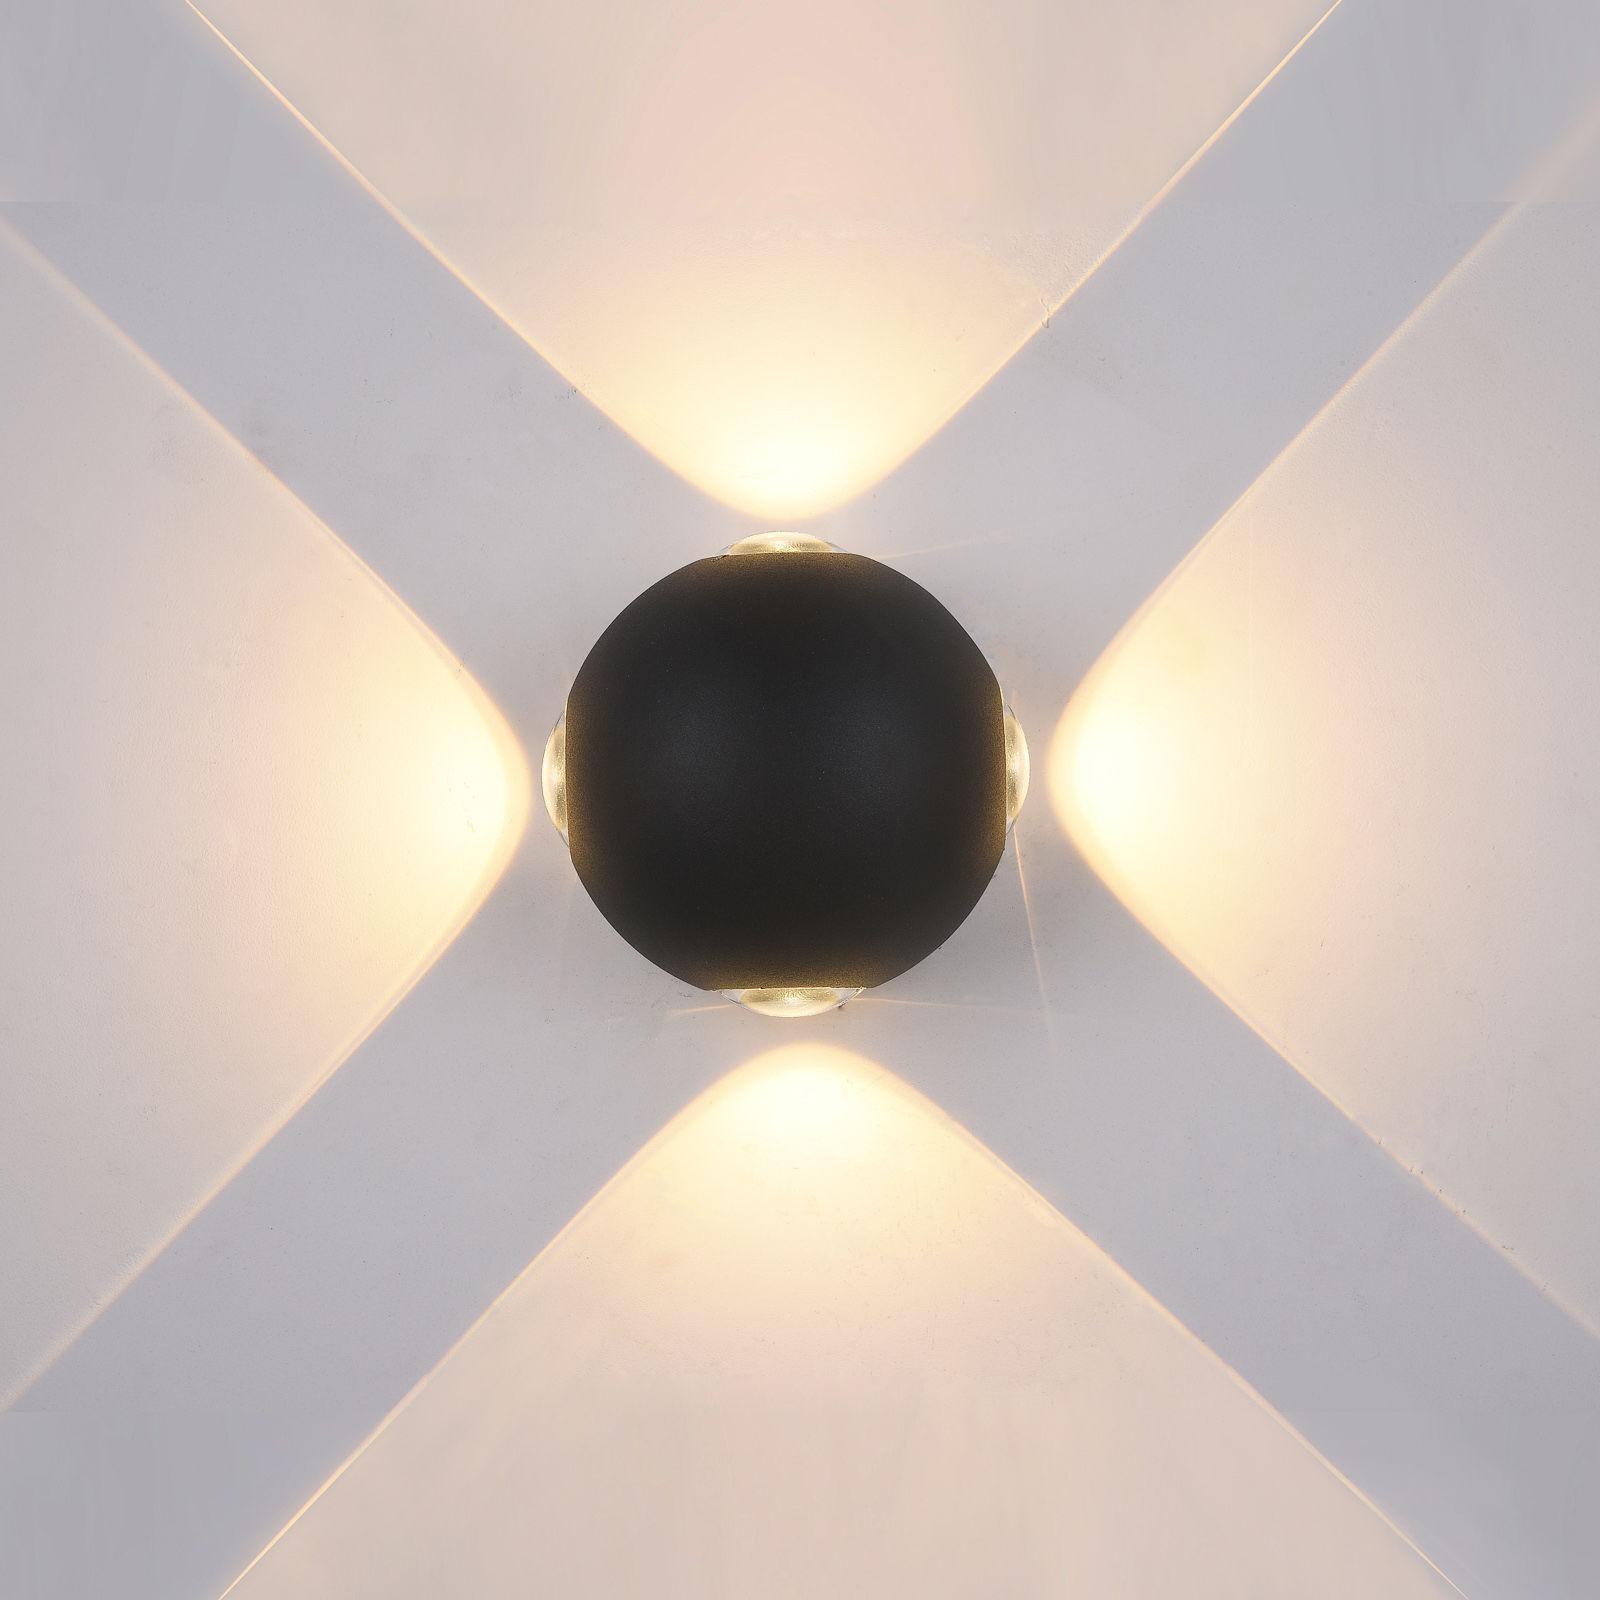 Italux kinkiet lampa ścienna Trivento PL-307B IP54 czarna LED 4W 3000K 10cm